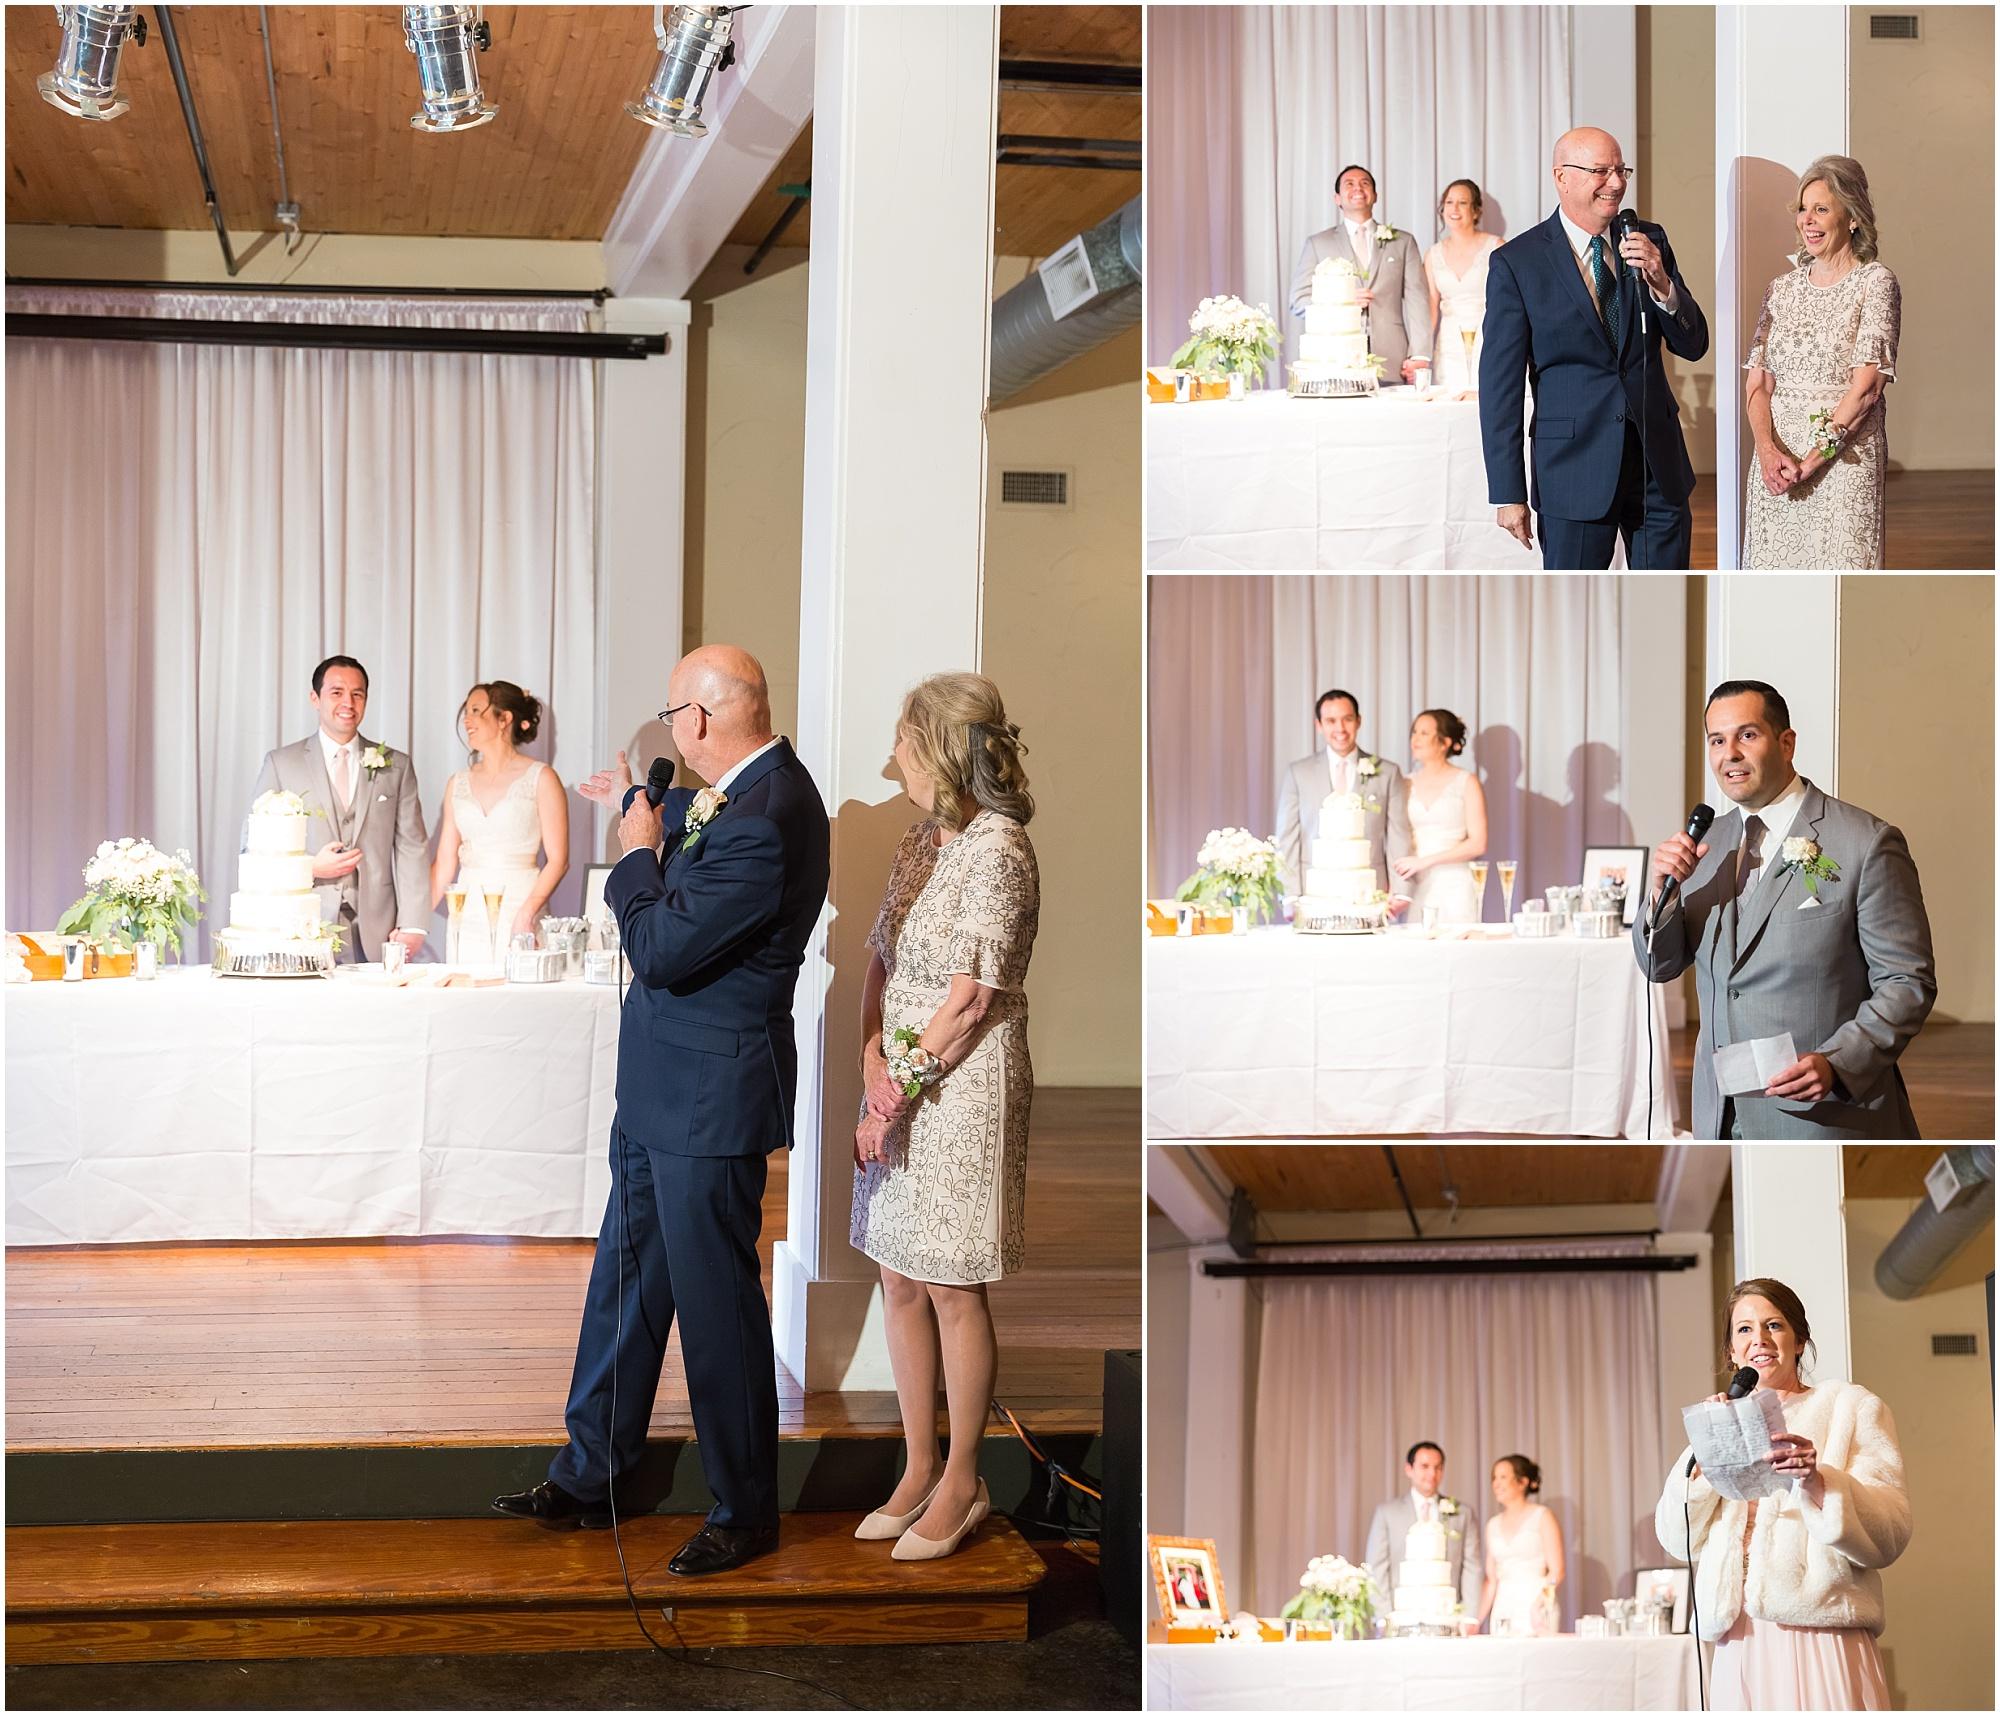 Downtown-Waco-Fall-Wedding_0033.jpg